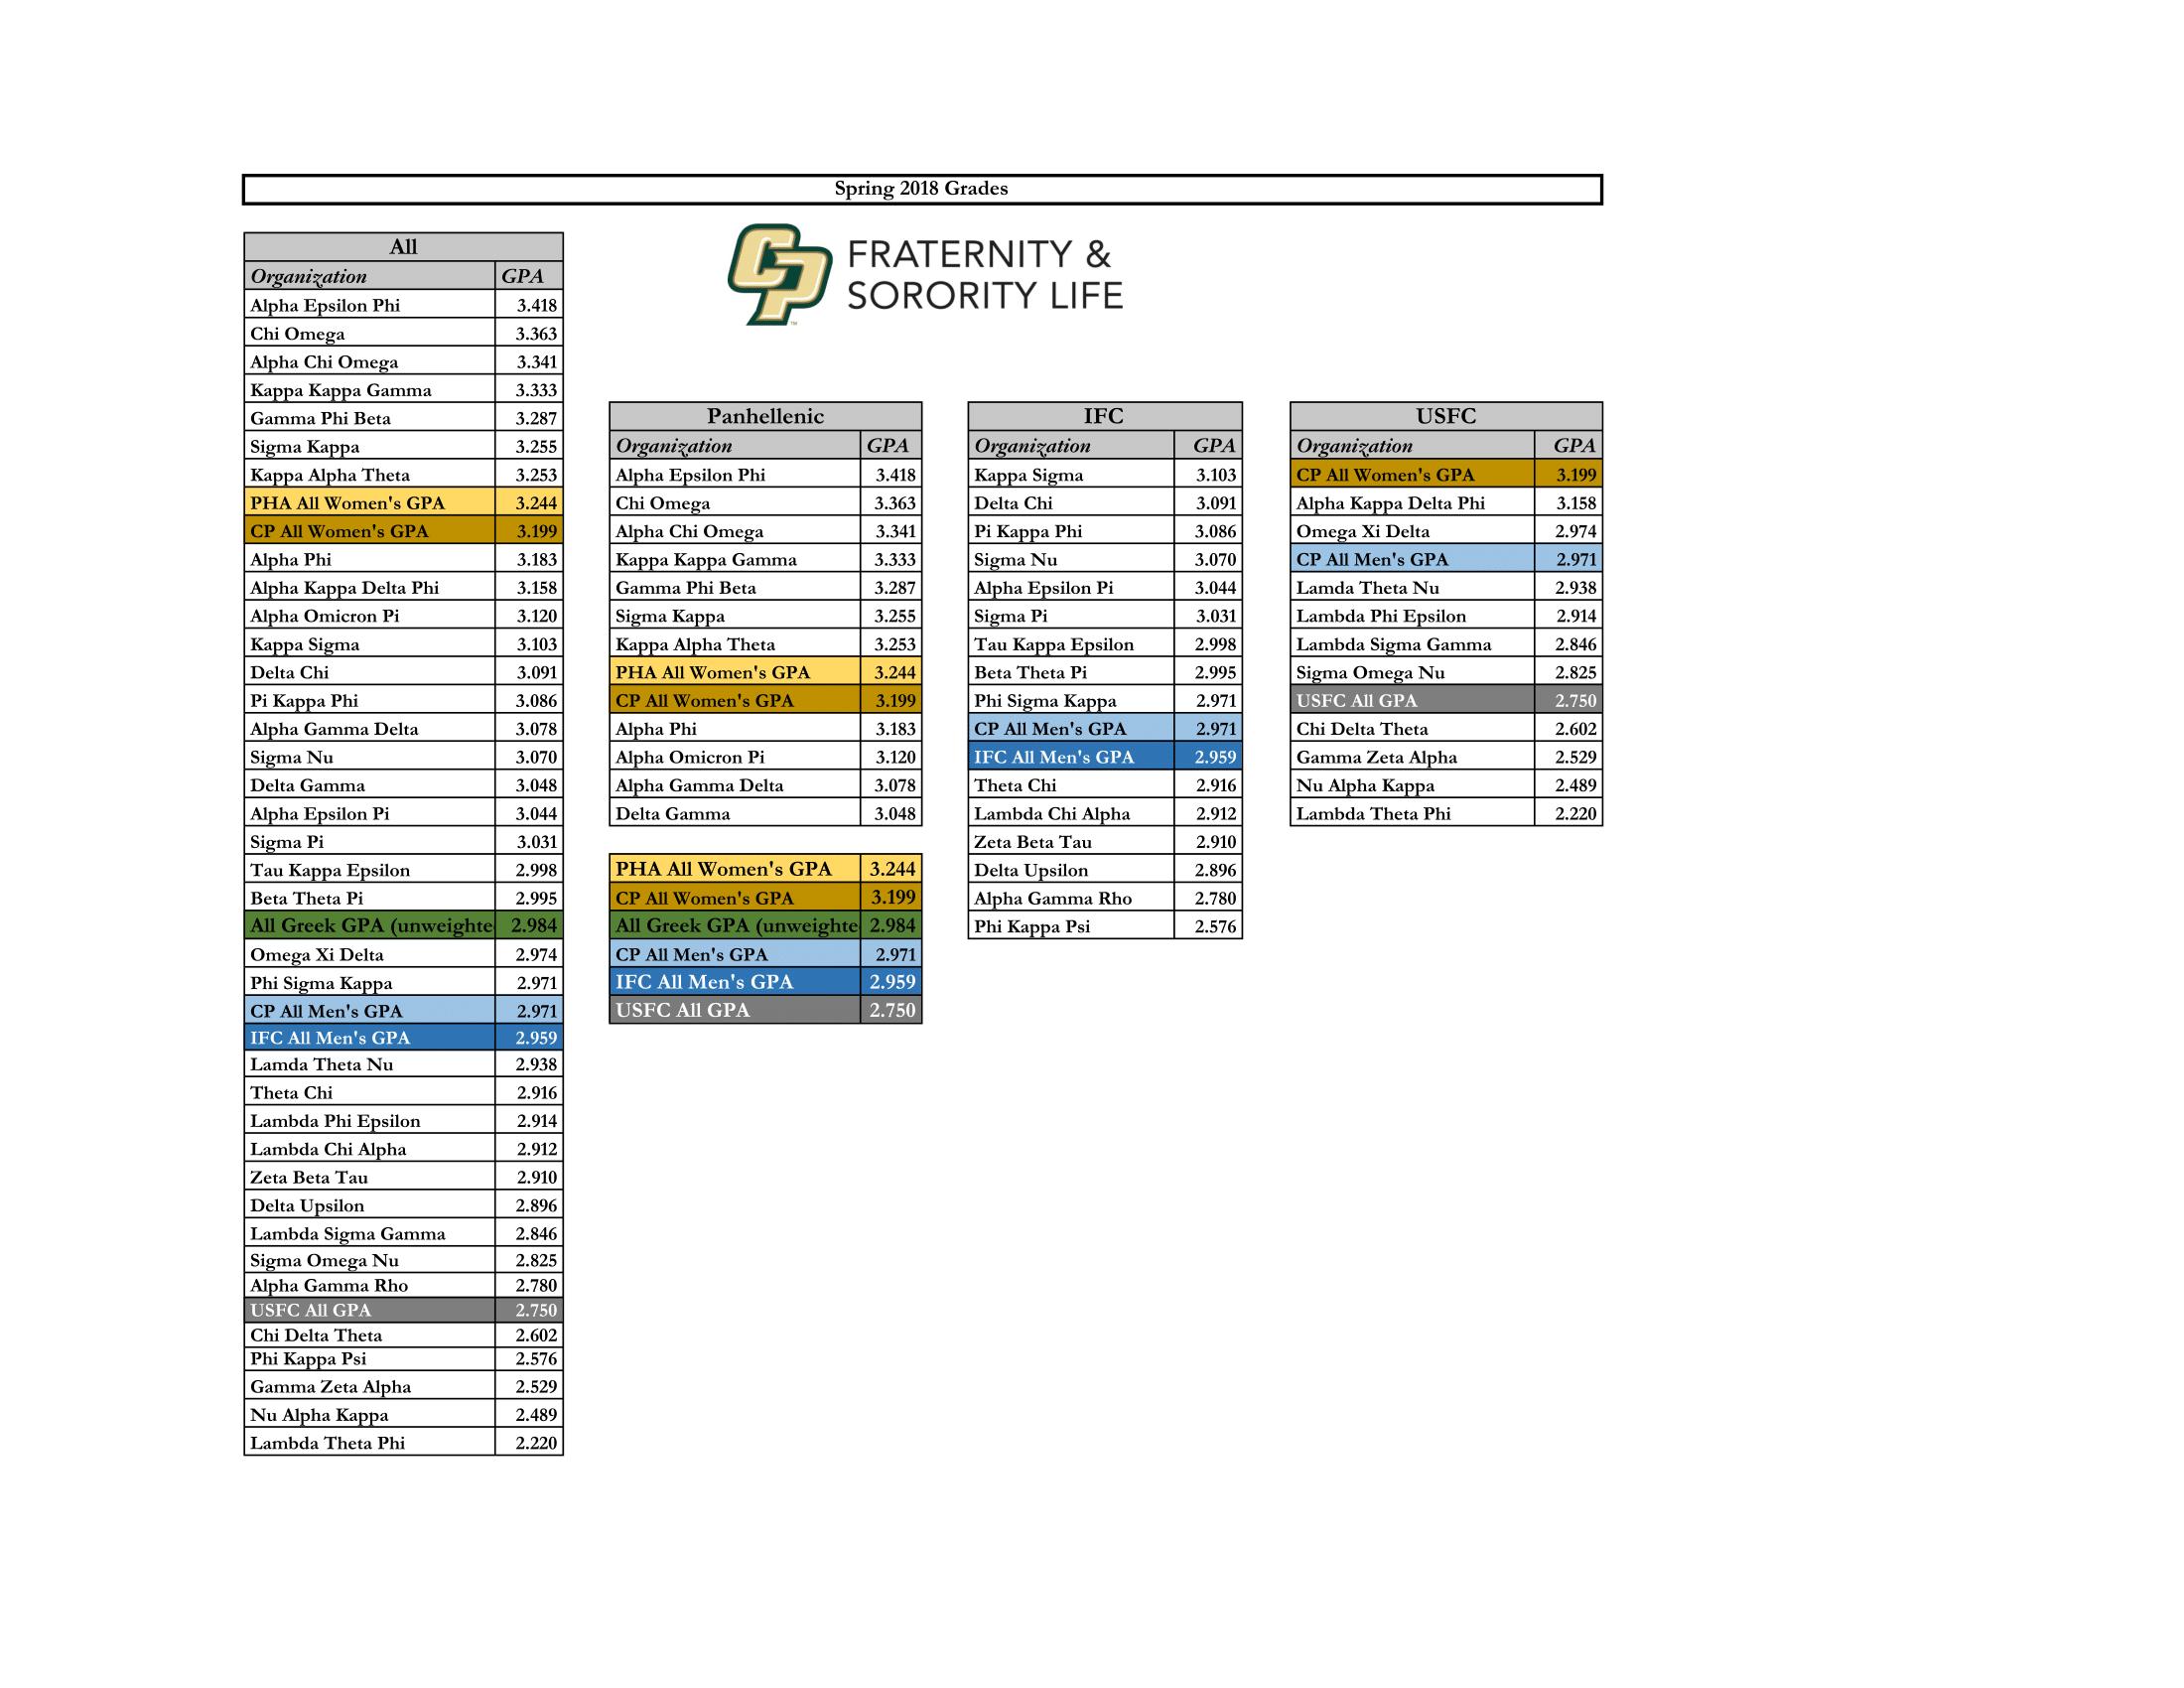 Spring 2018 Academics Link